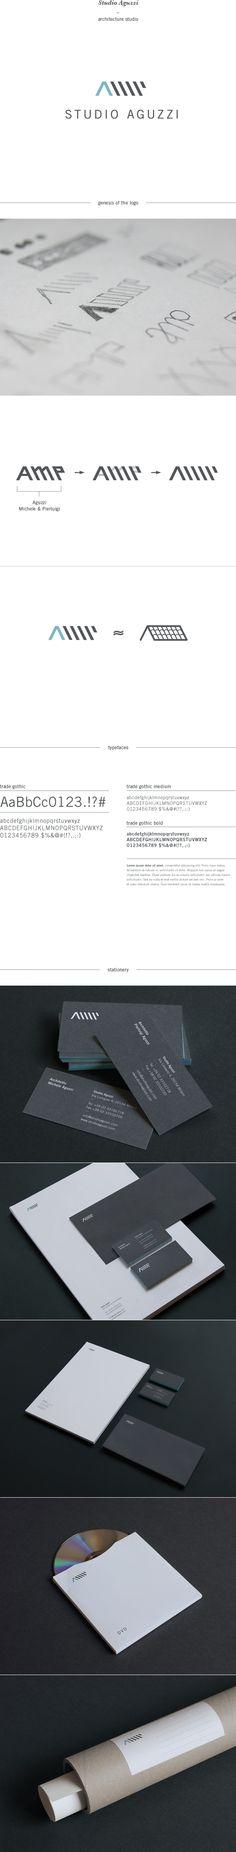 Studio Aguzzi - Architecture Studio by Giorgia Smiraglia, via Behance | #stationary #corporate #design #corporatedesign #identity #branding #marketing < repinned by www.BlickeDeeler.de | Visit our website: www.blickedeeler.de/leistungen/corporate-design